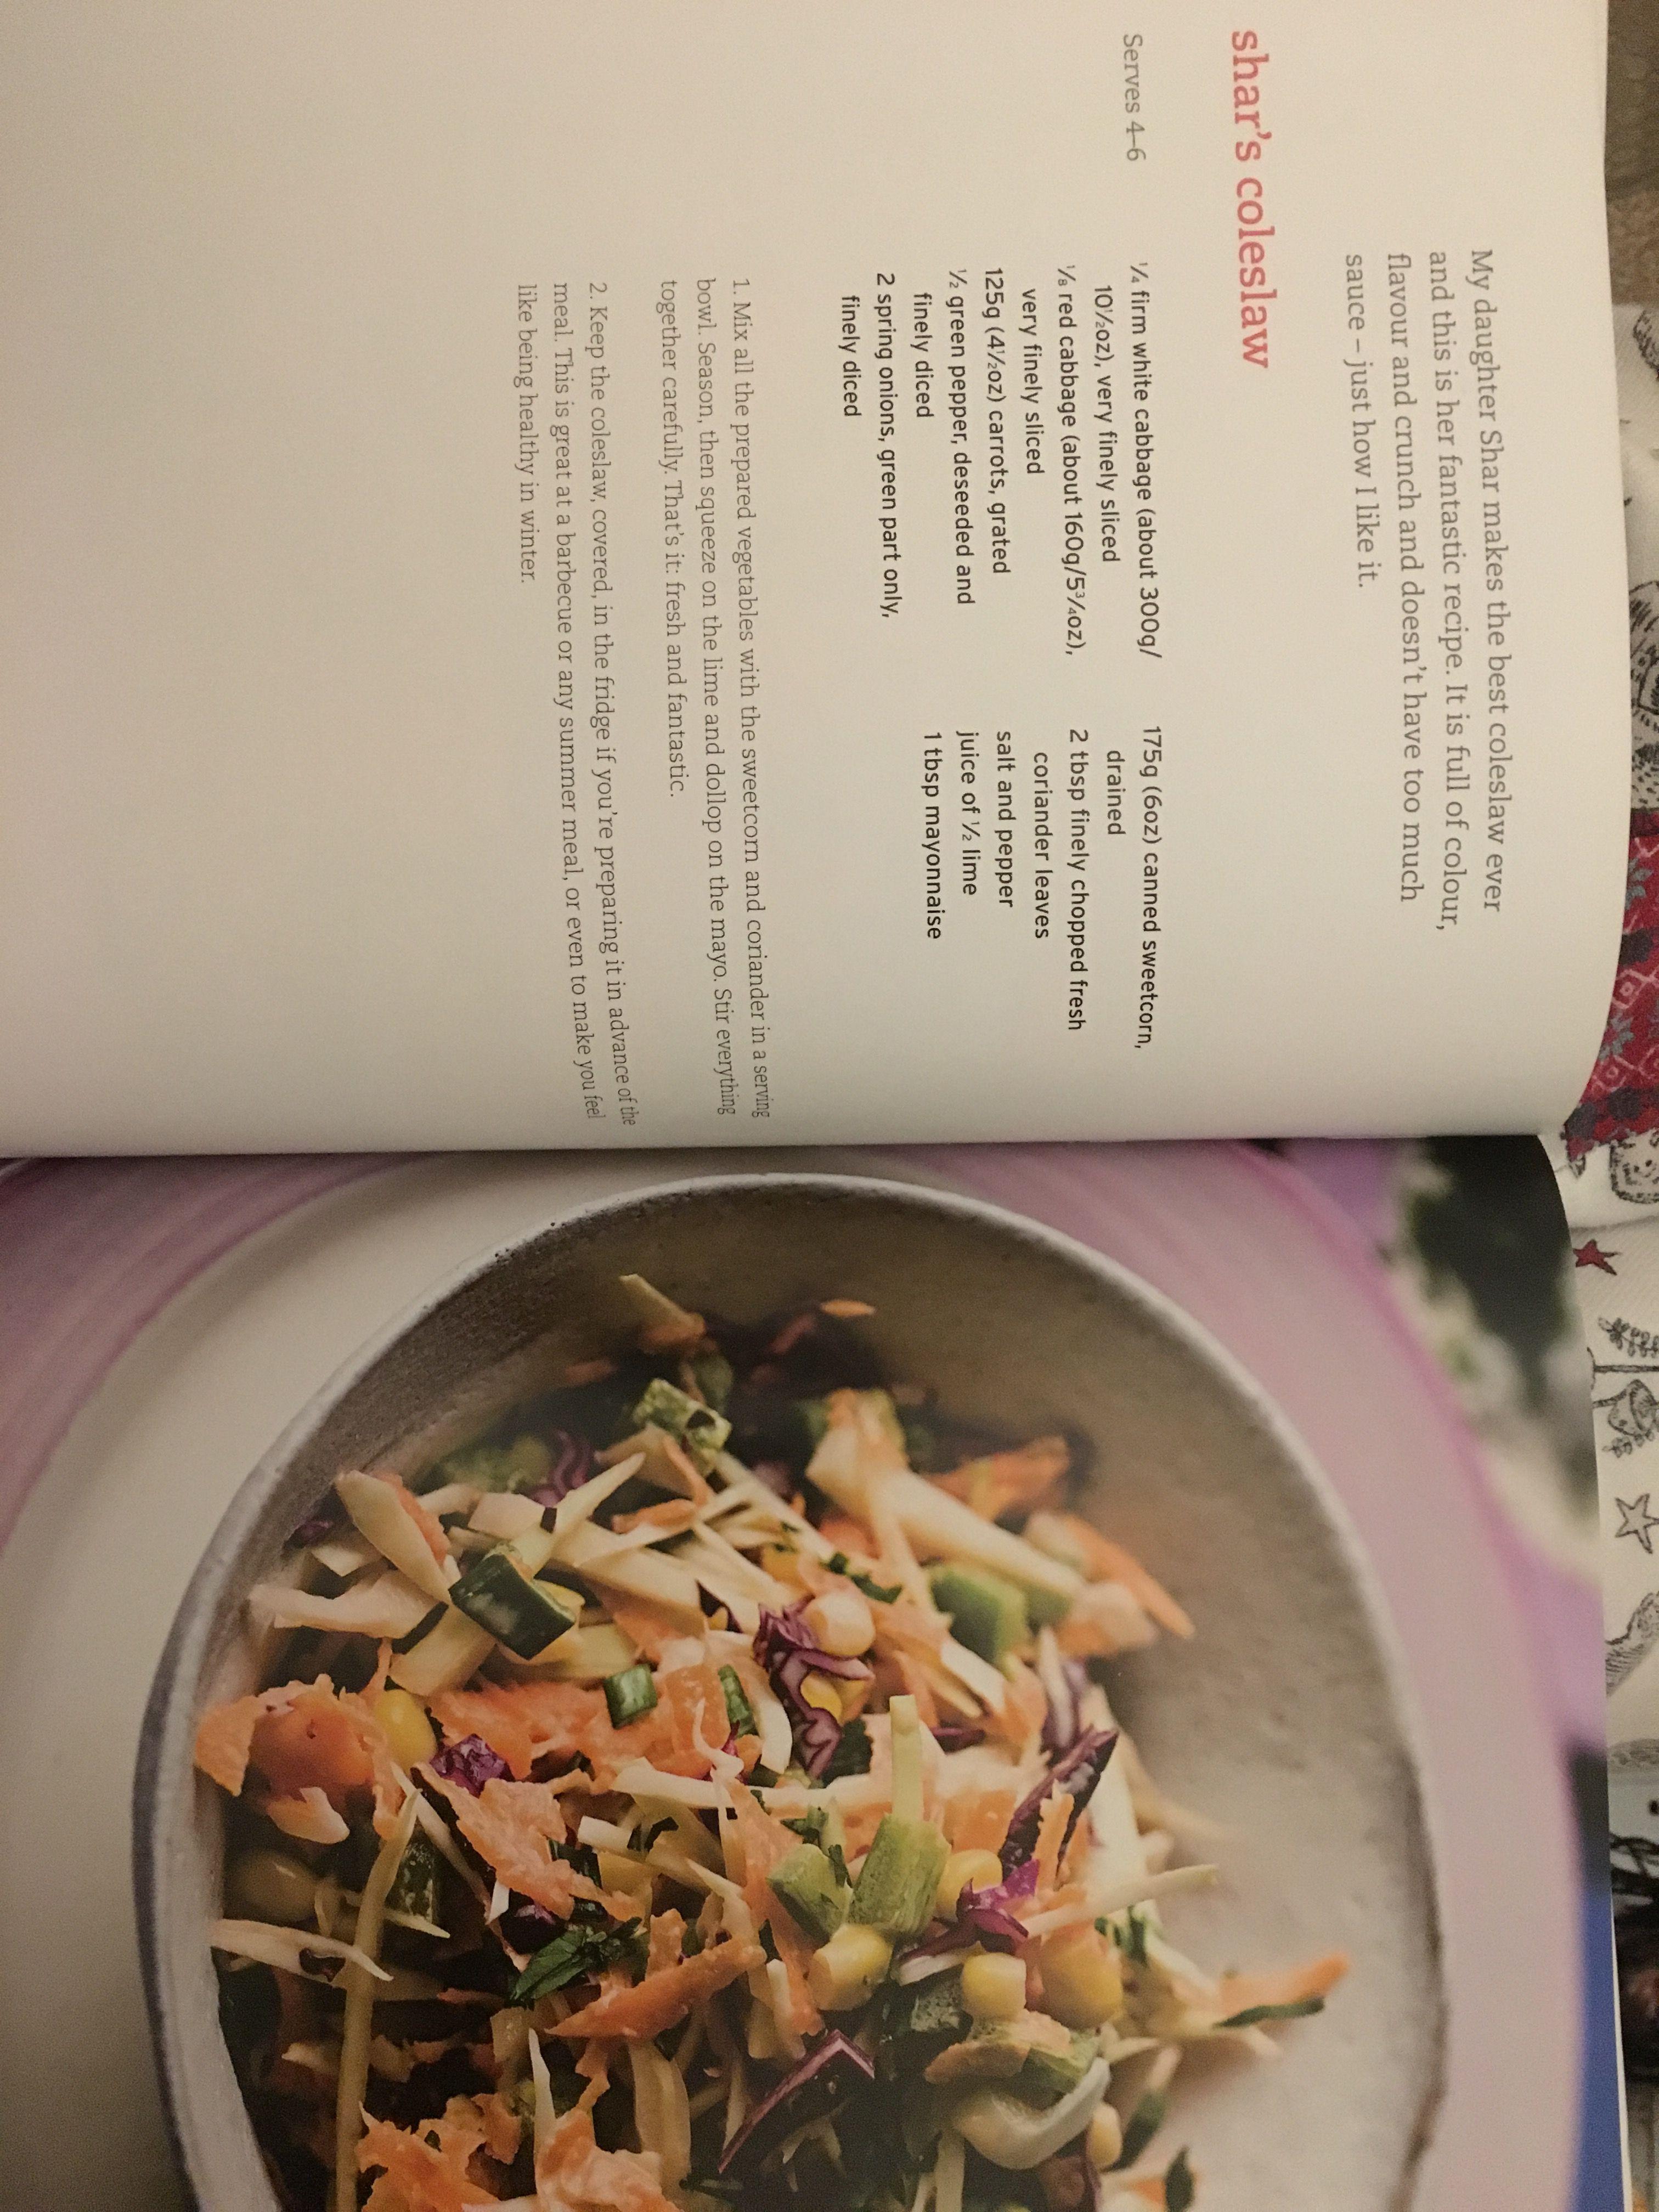 Levi Roots | Stuffed peppers, Healthy recipes, Stuffed ...